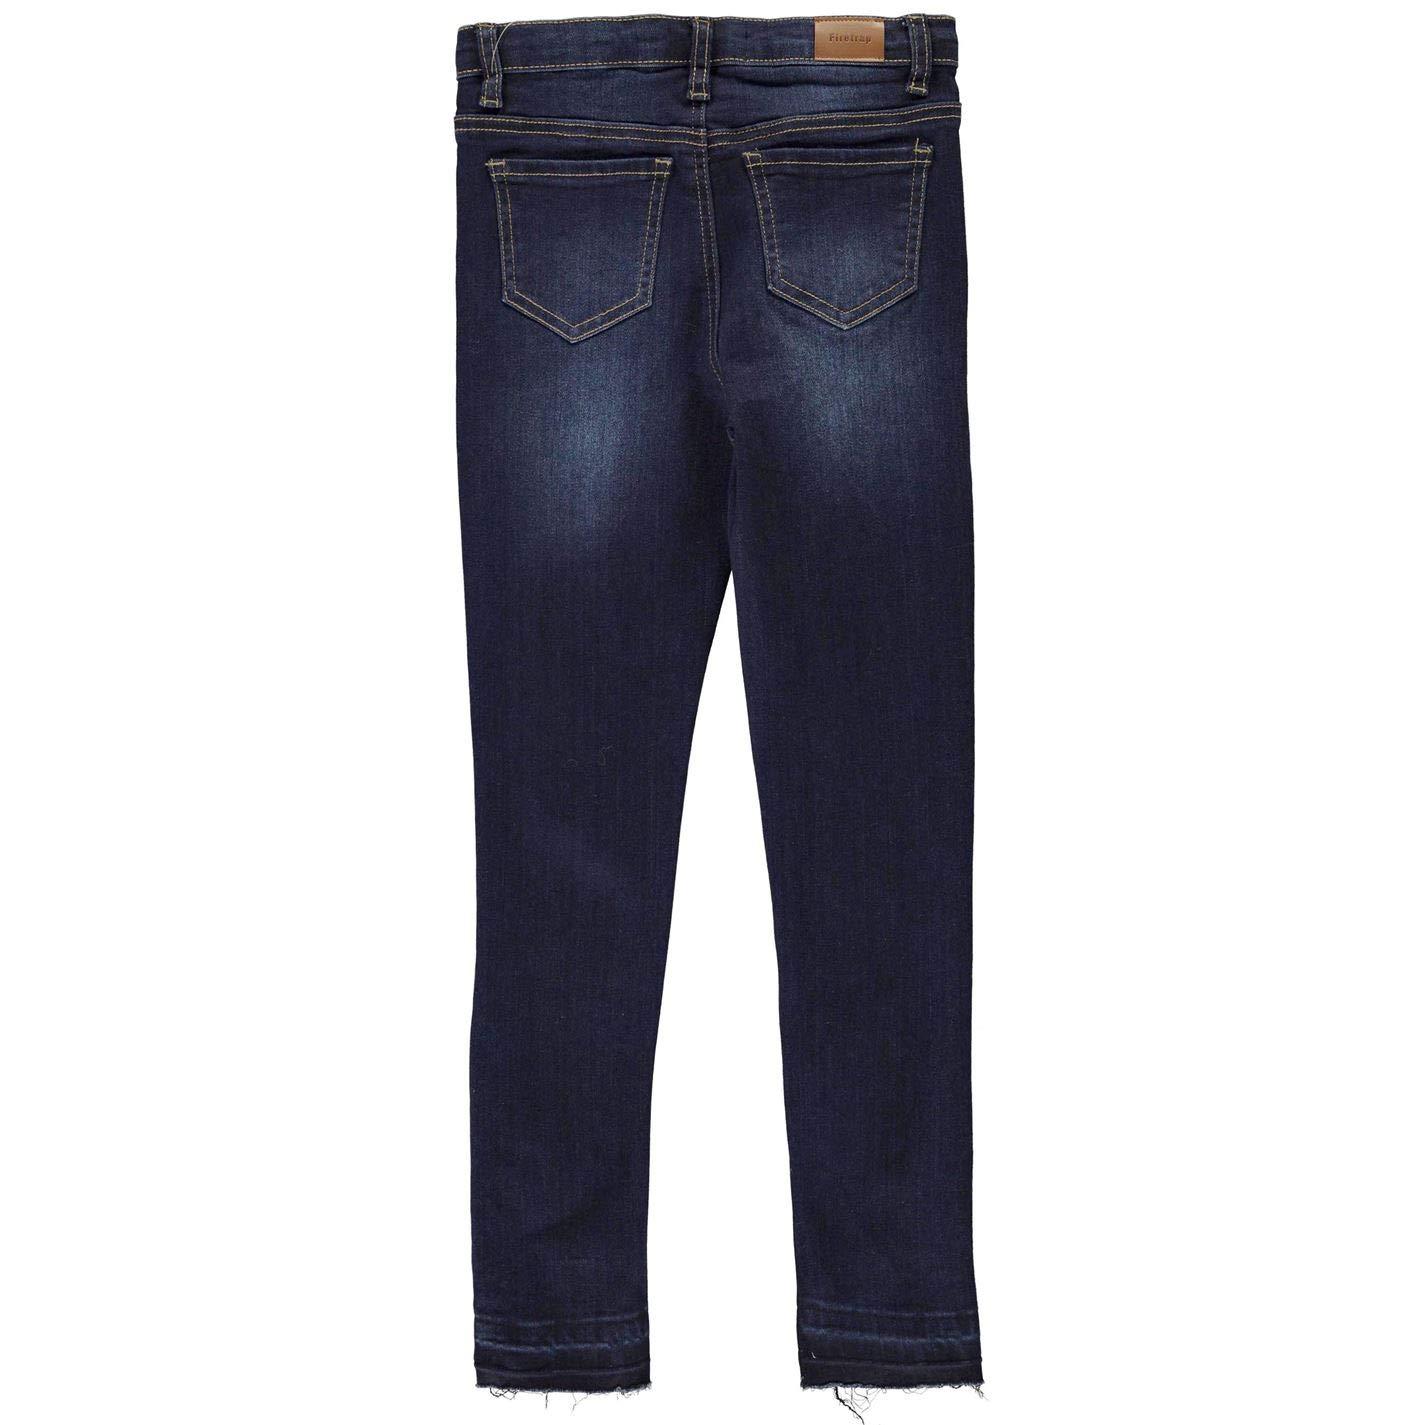 Firetrap Kids Girls Skinny Jeans Junior Pants Trousers